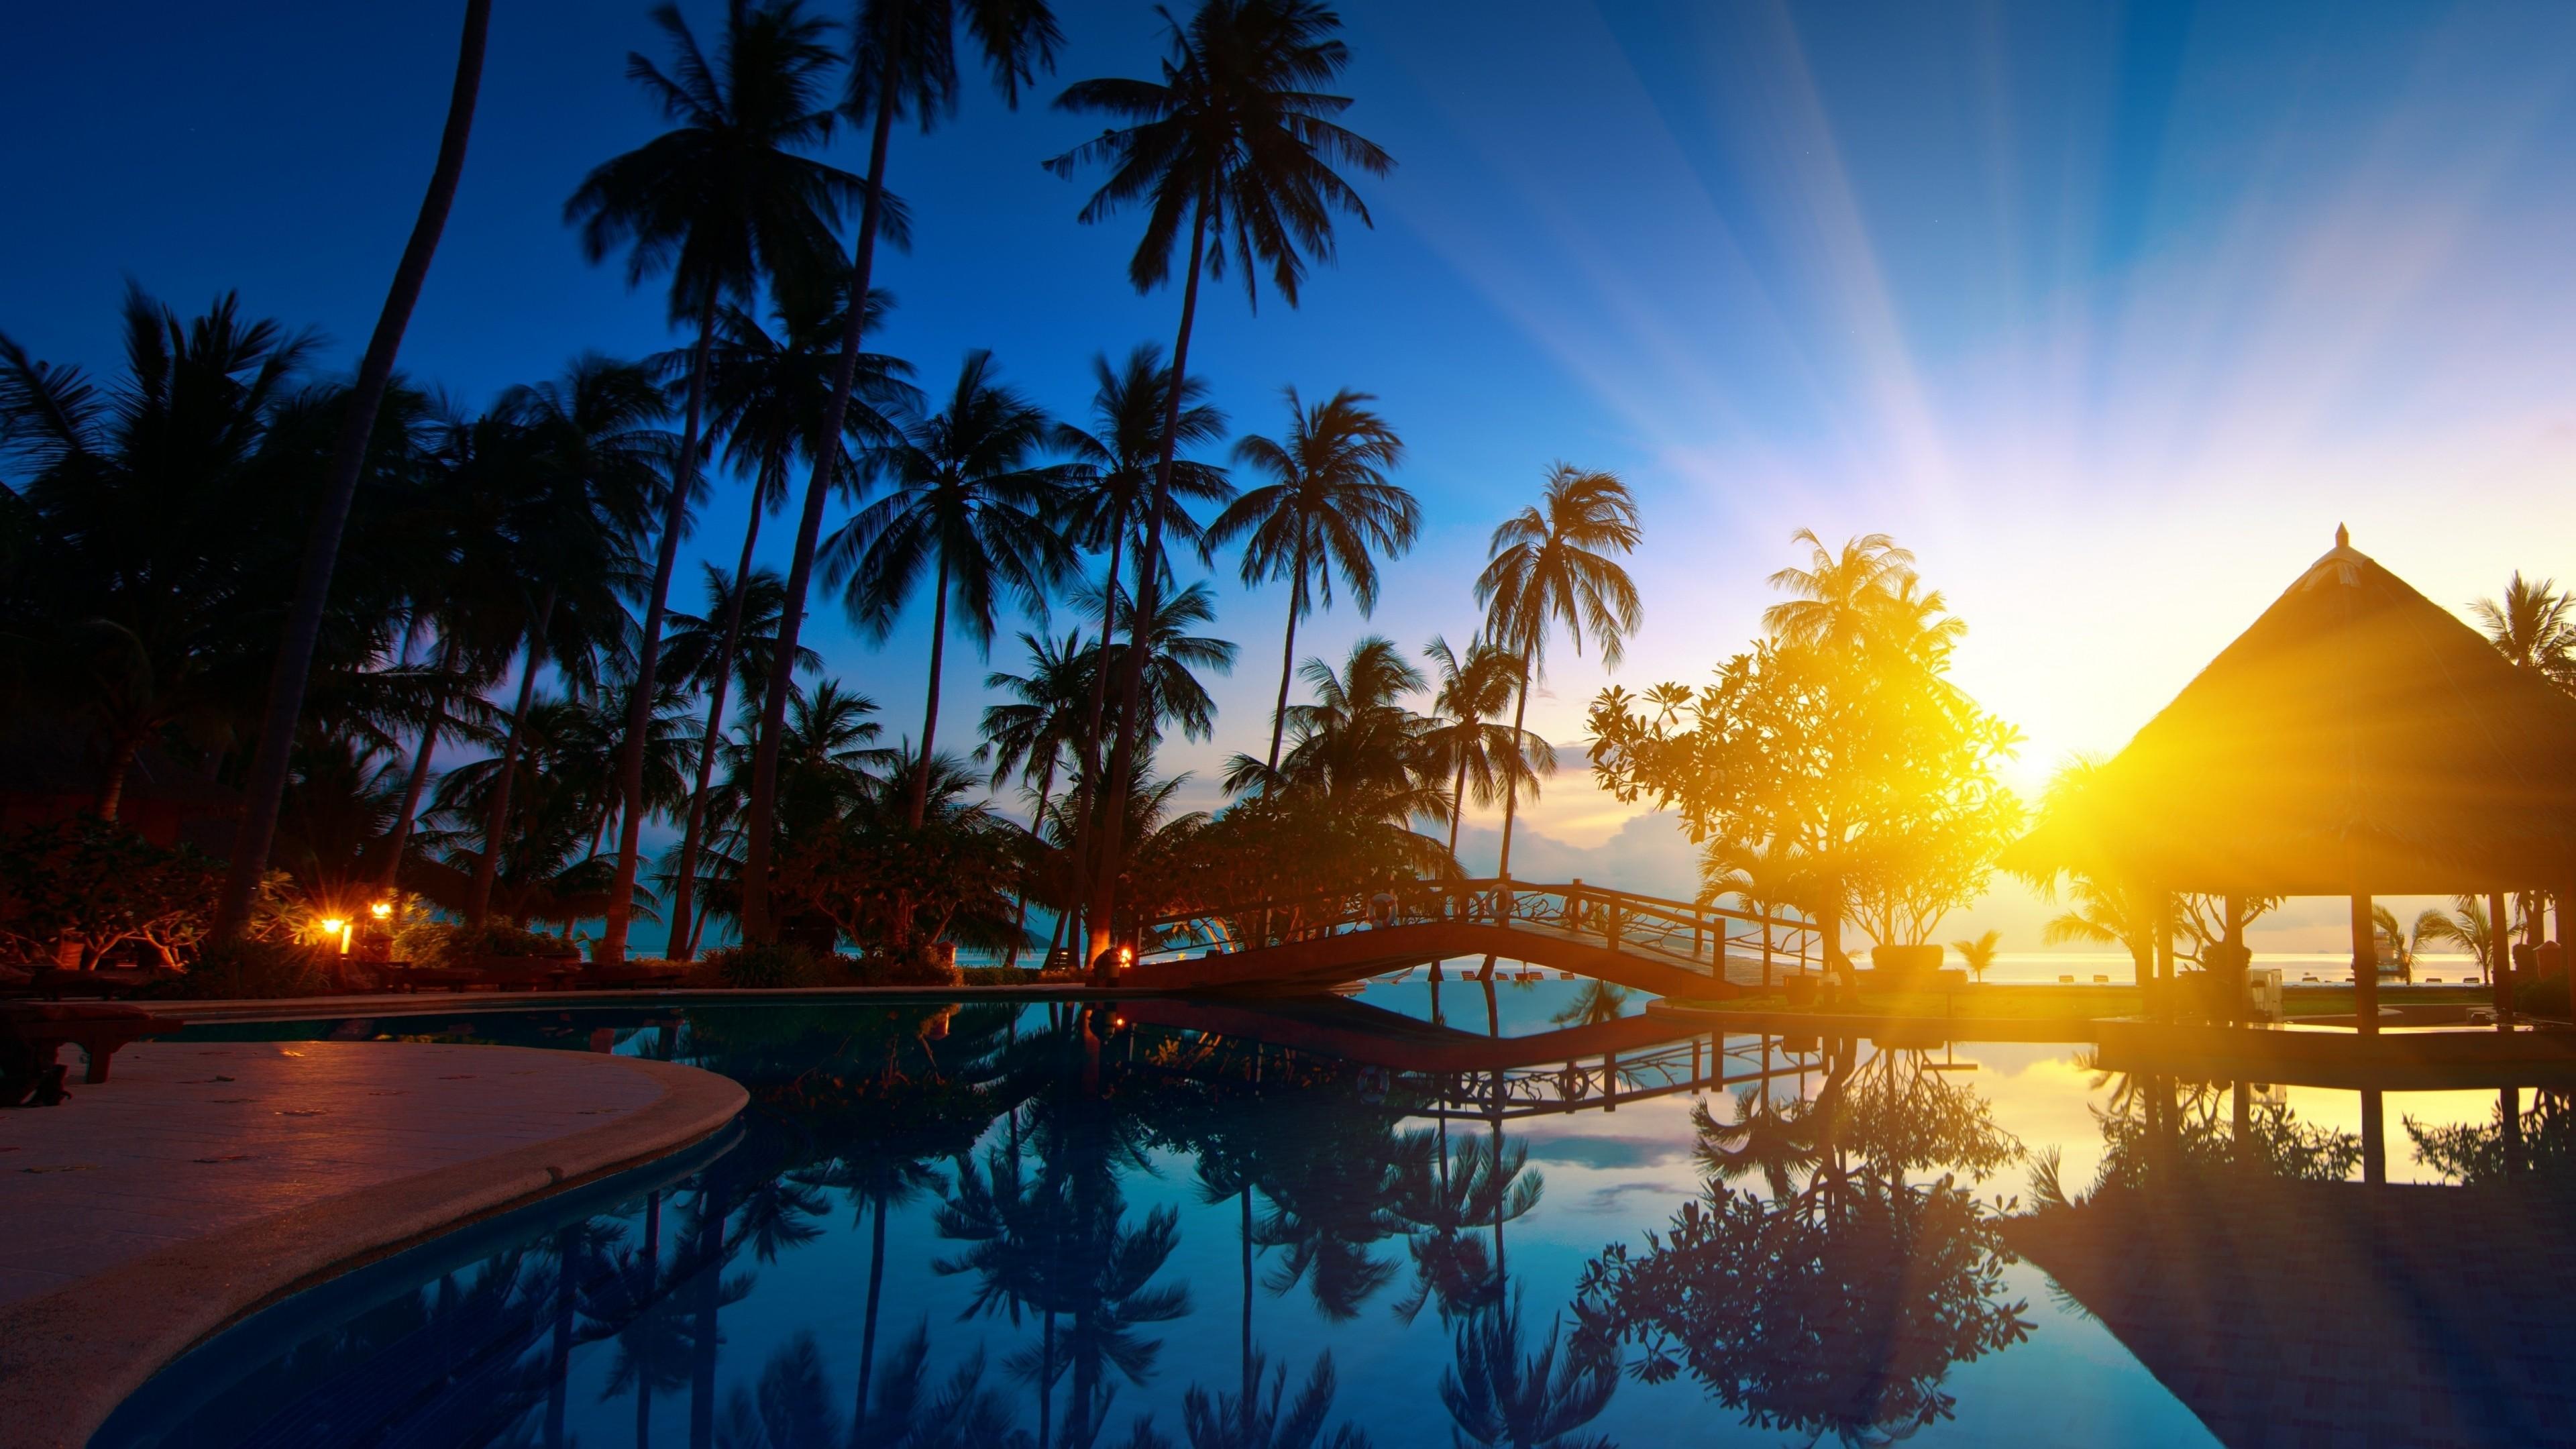 … Background 4K Ultra HD. Wallpaper sunrise, thailand,  paradise, trees, sea water, palm trees,